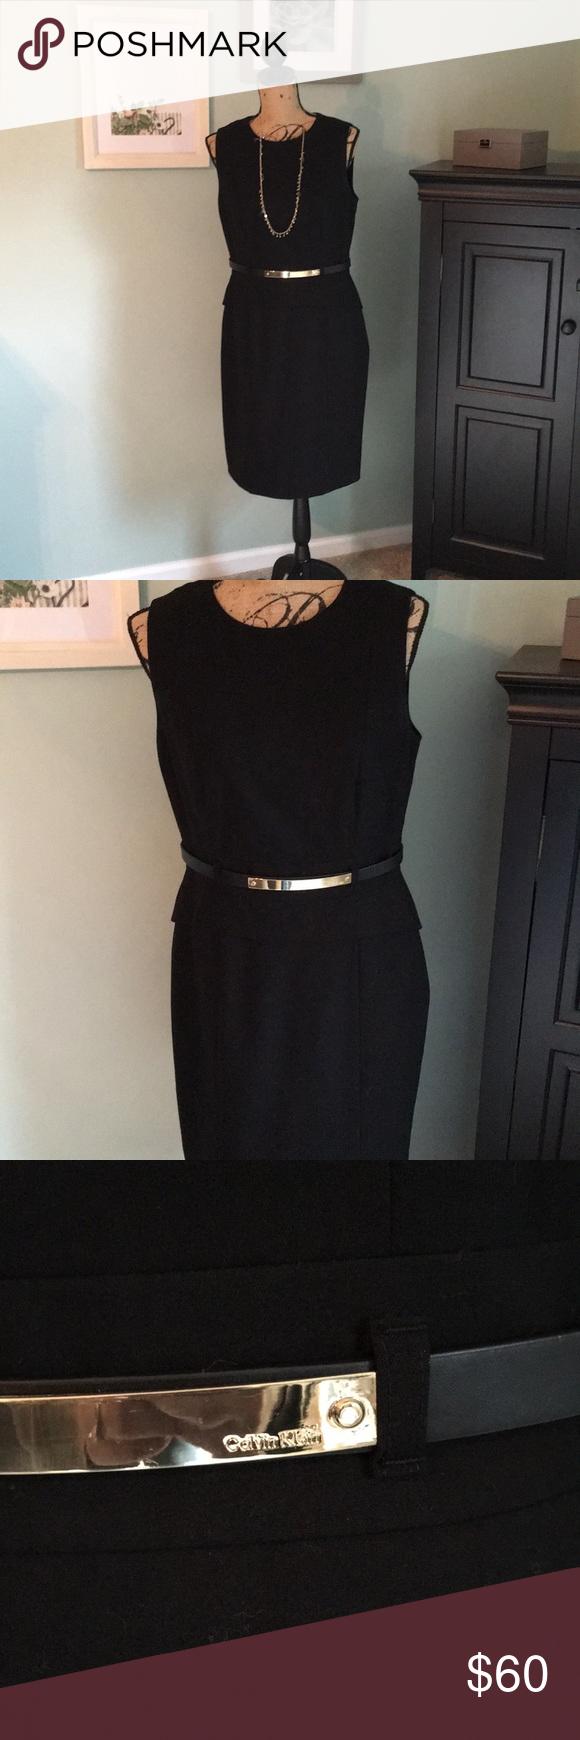 Black Calvin Klein Dress With Gold Accent Belt Black Calvin Klein Peplum Dress With Gold Accent Belt Size 10 Dry Cl Fashion Calvin Klein Dress Clothes Design [ 1740 x 580 Pixel ]